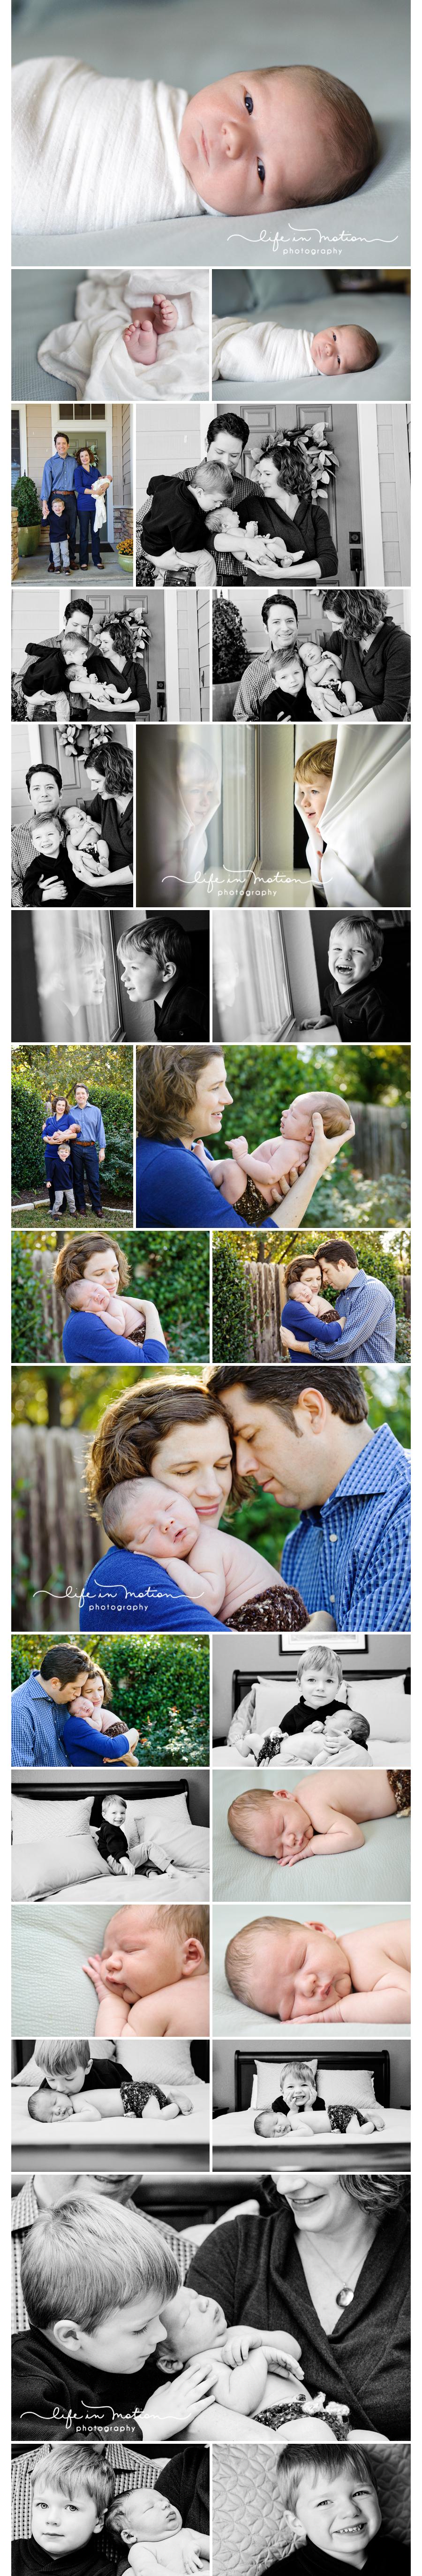 austin_infant_newborn_baby_photographers